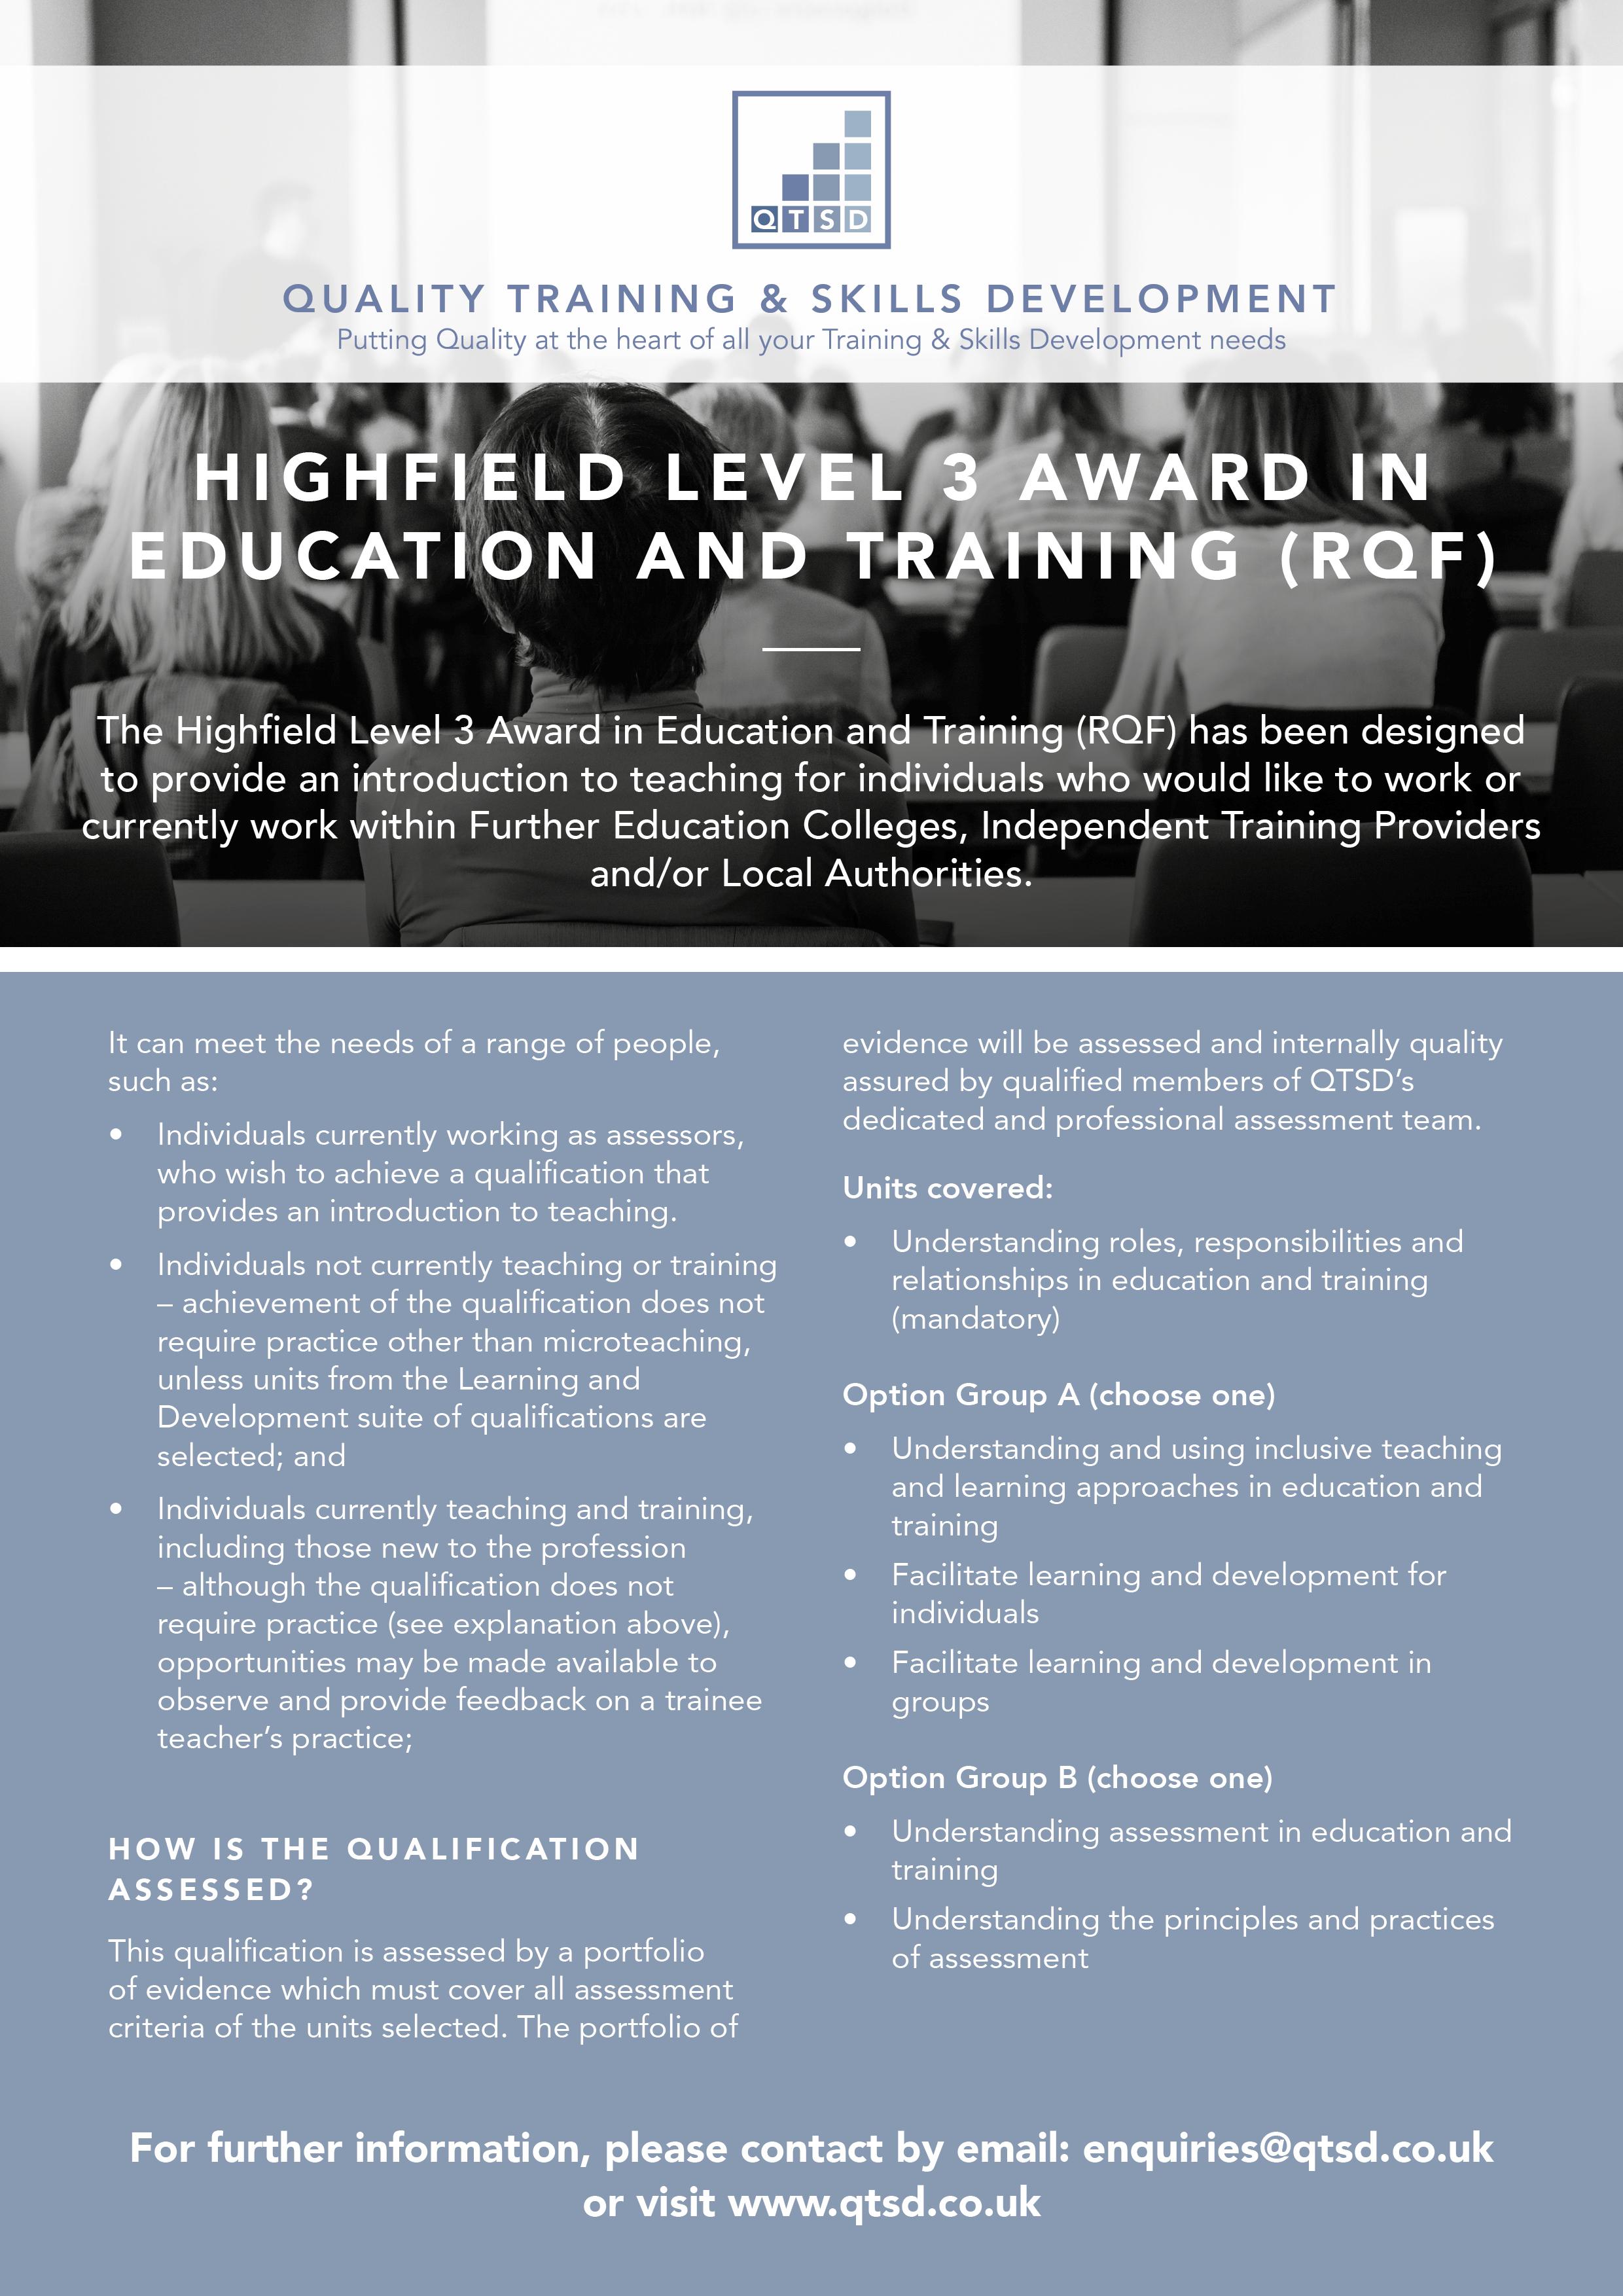 QTSD  Education and Training (RQF)  LEAFLET.jpg